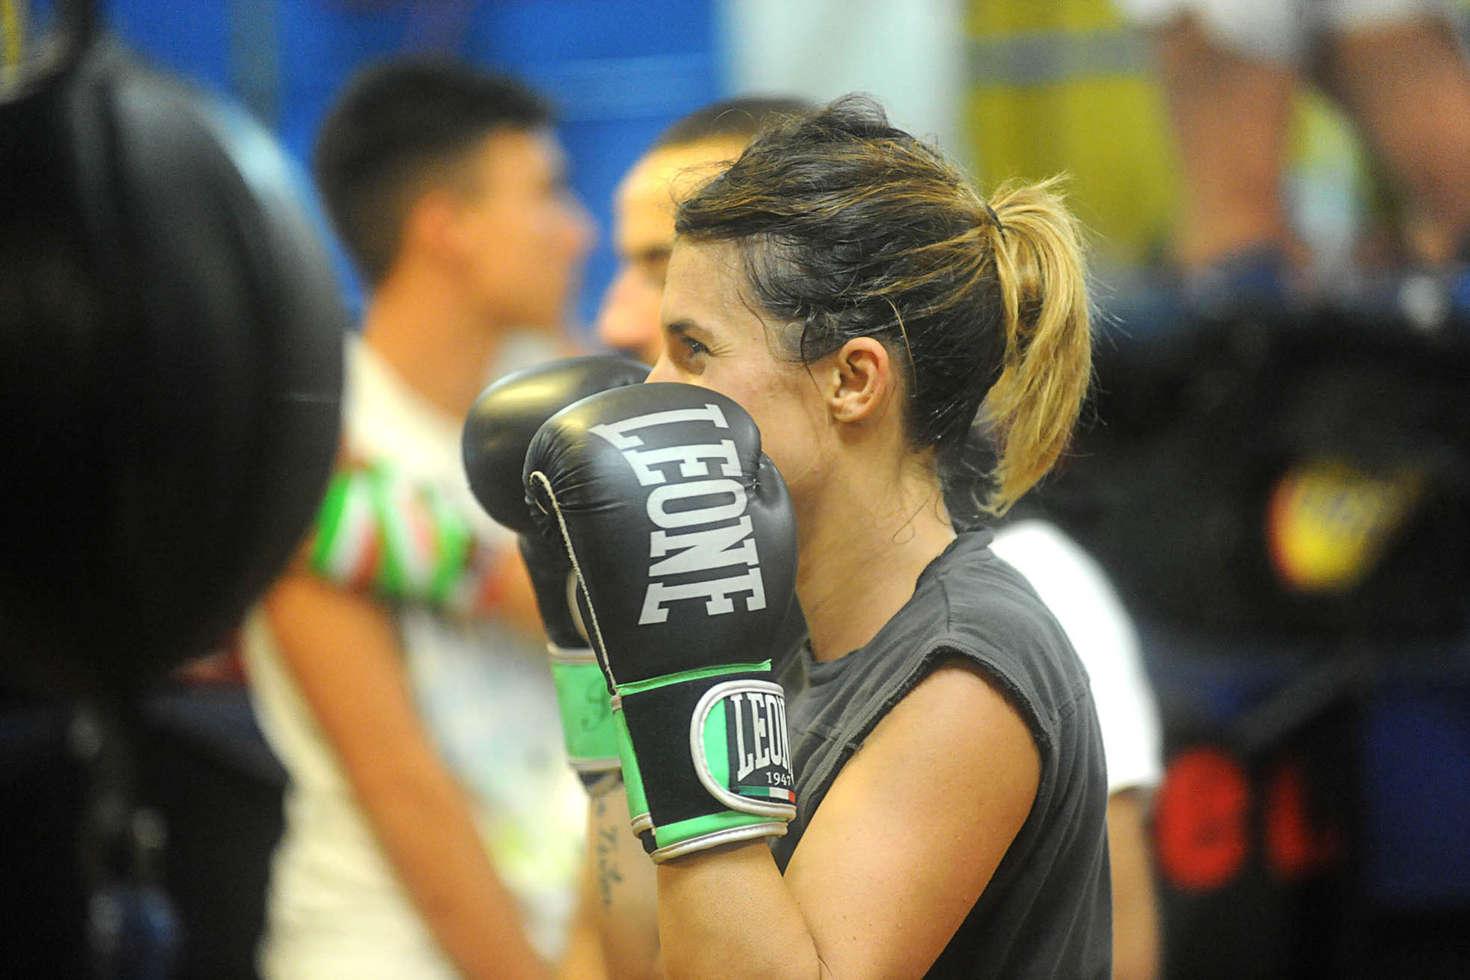 Elisabetta canalis kickboxing in the gym 19 gotceleb for Gimnasio 19